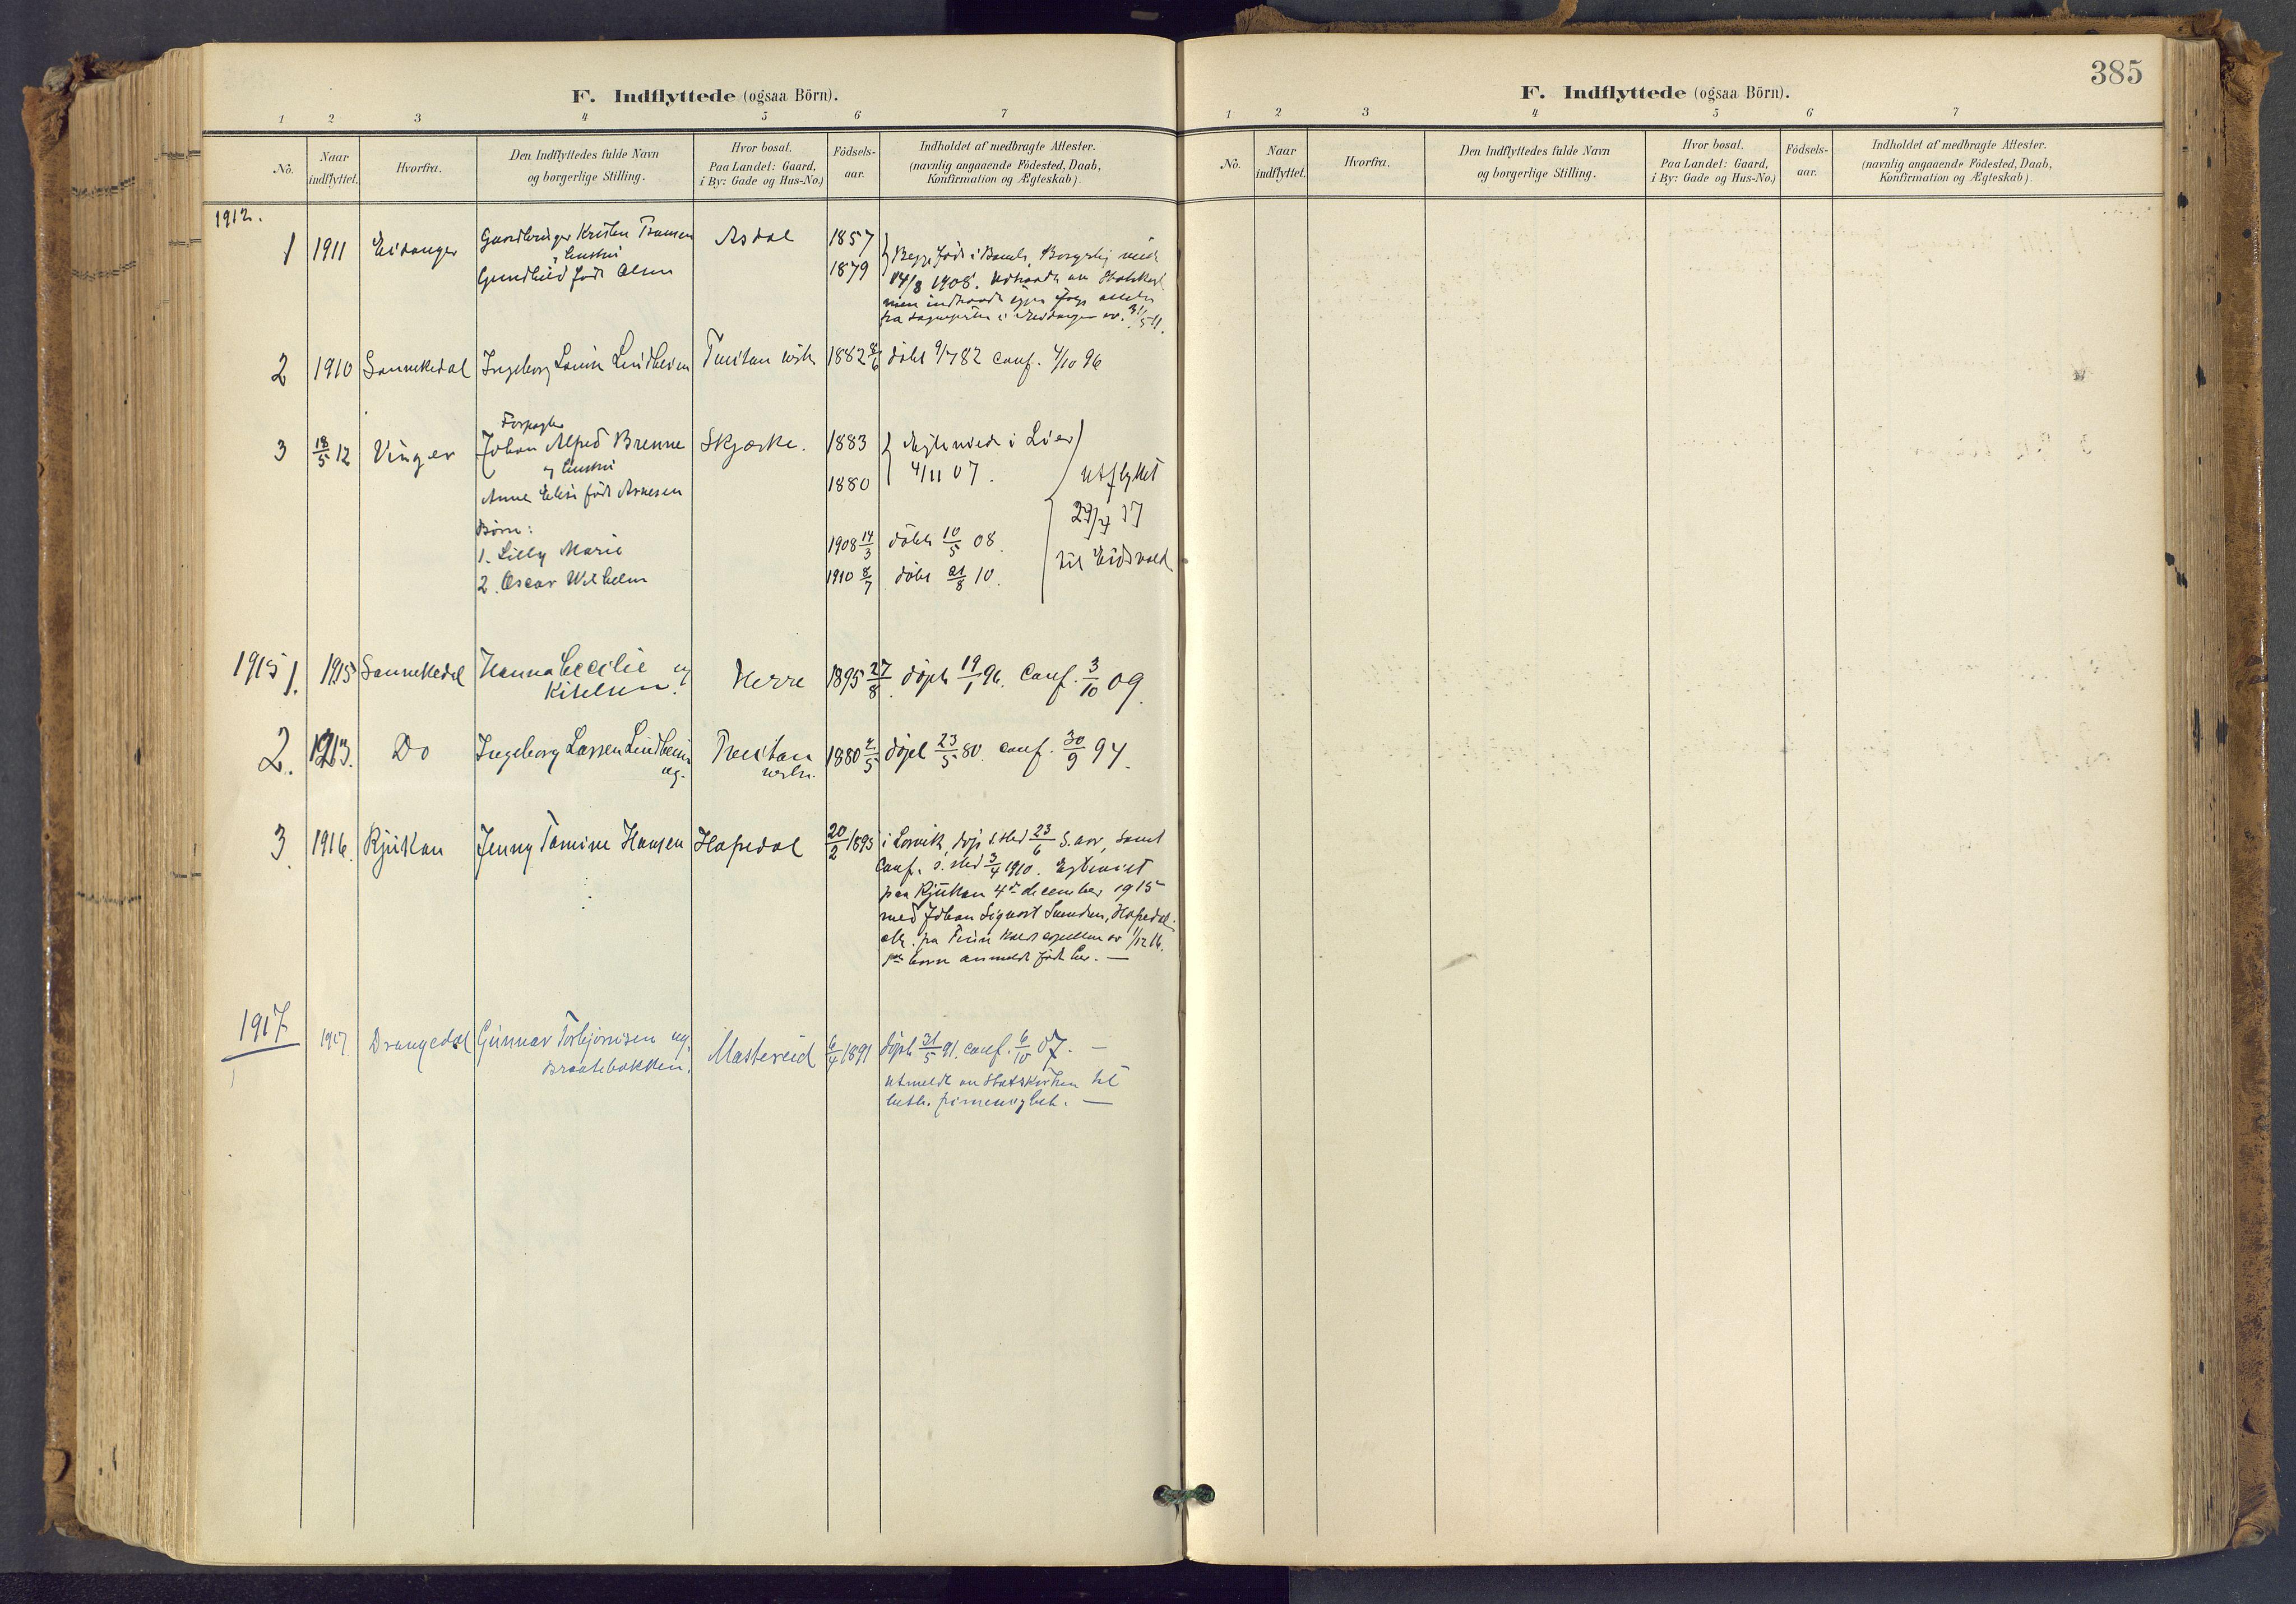 SAKO, Bamble kirkebøker, F/Fa/L0009: Ministerialbok nr. I 9, 1901-1917, s. 385